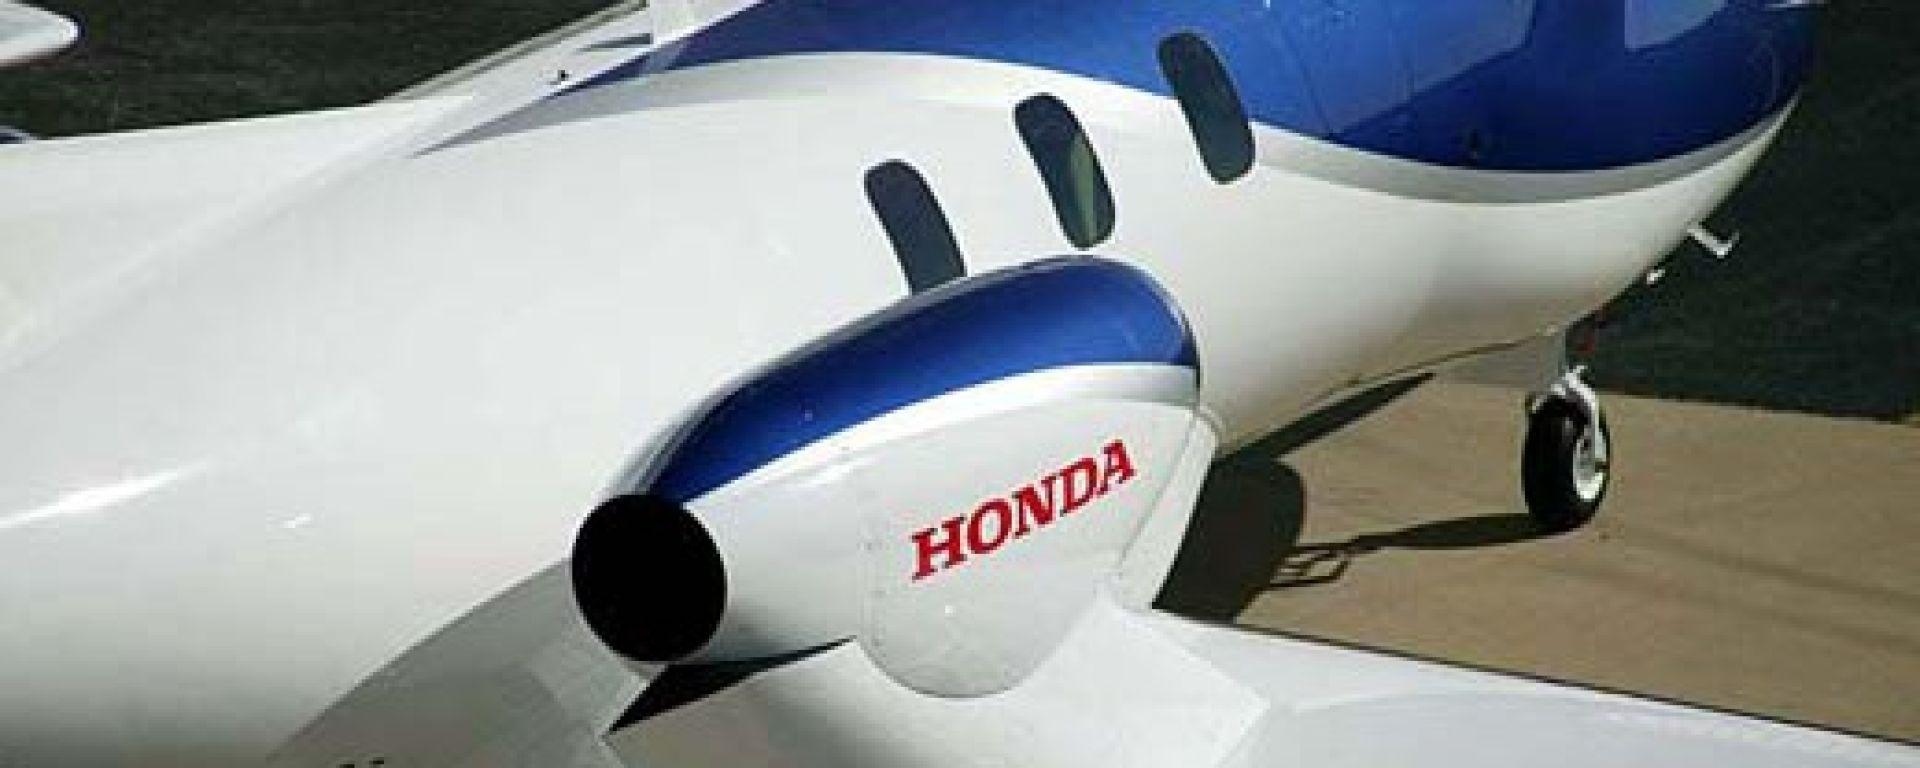 Hondajet: vola fino a 757 km/h